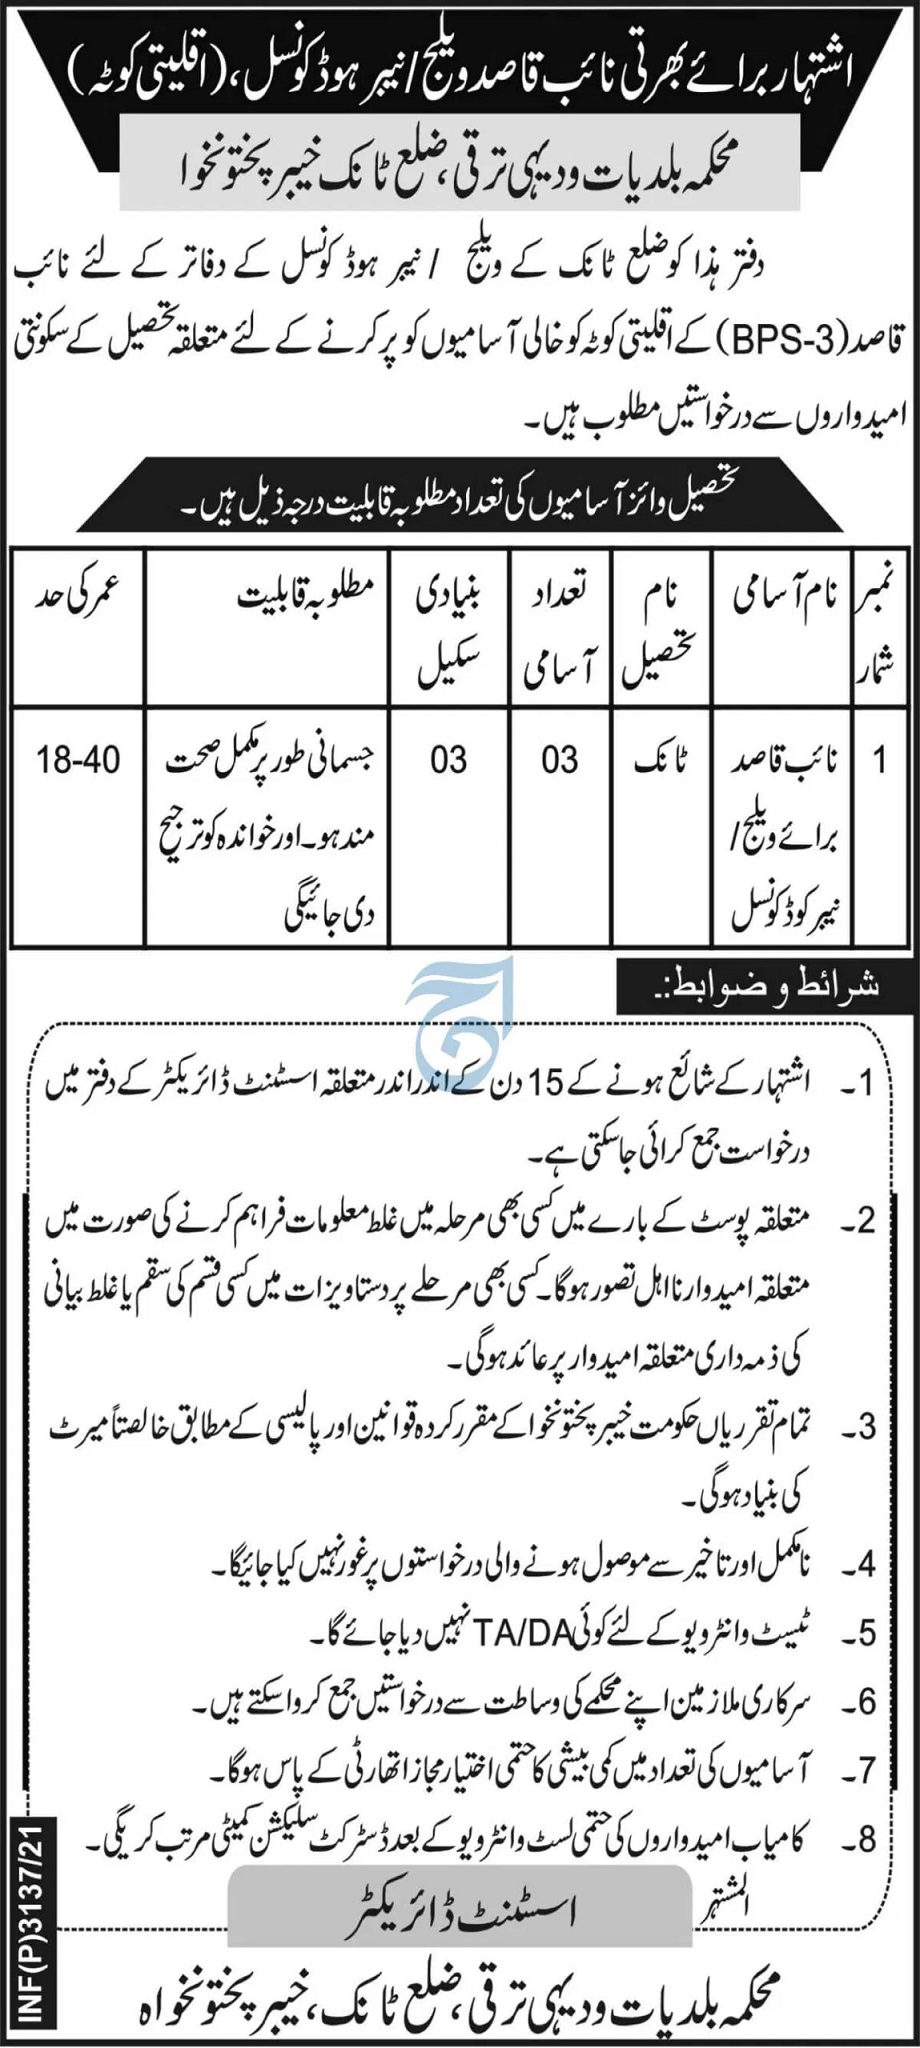 Lower Dir Tank Local Government KPK Govt jobs in Peshawar Today